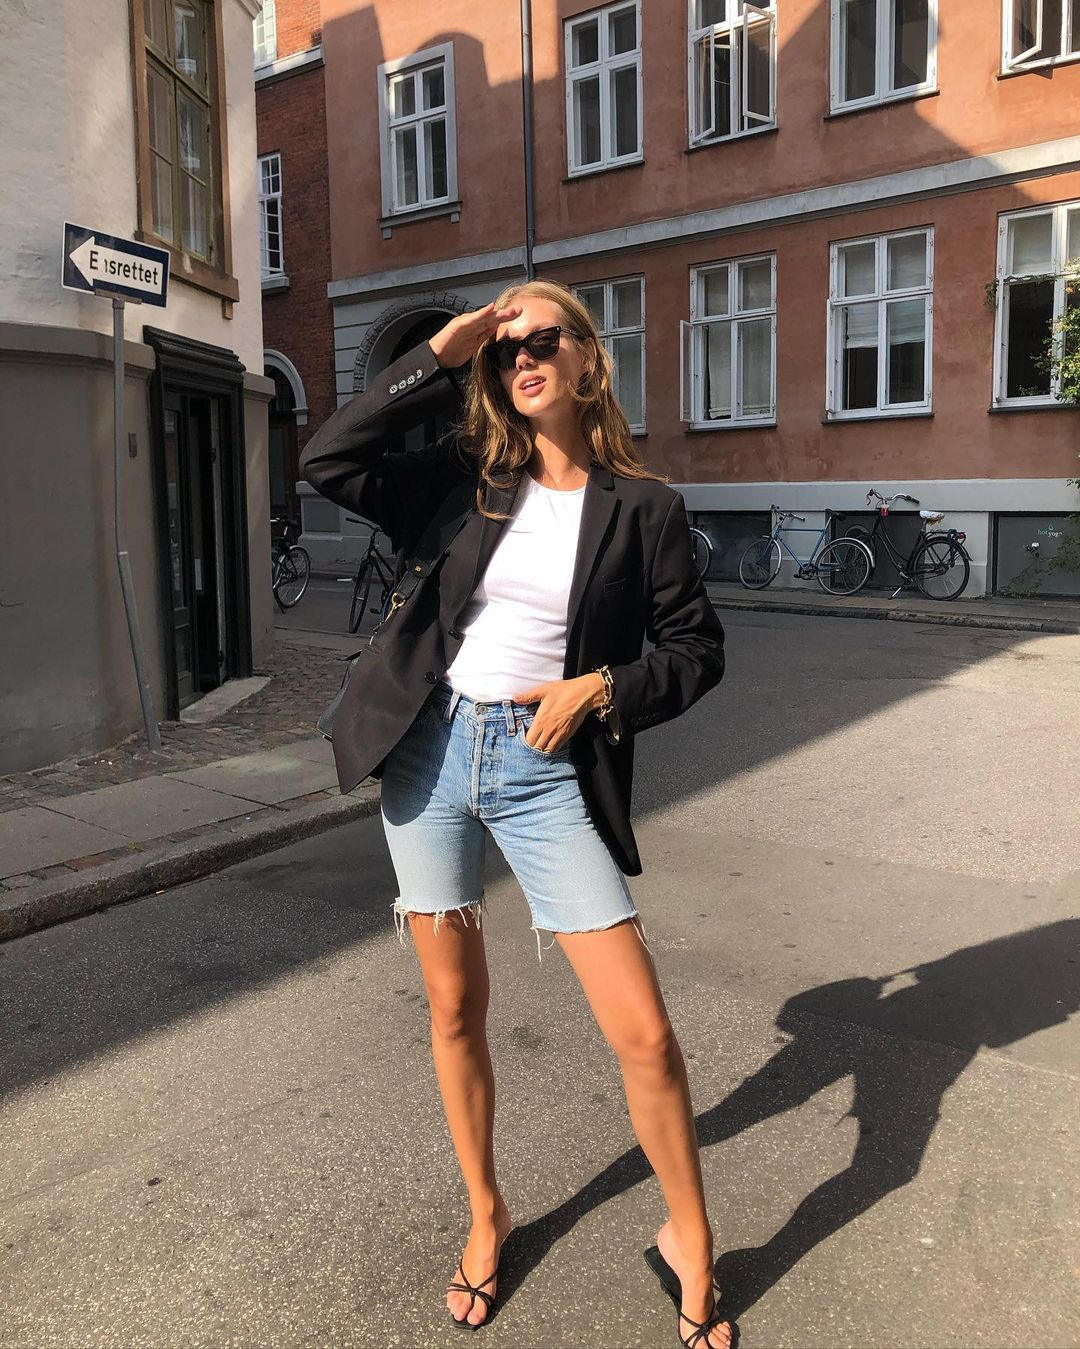 3 Ways to Wear Denim Bermuda Shorts Like an It Girl — Cecilie Moosgaard Nielsen in a black blazer, white t-shirt, long jean shorts, and strappy slide sandals